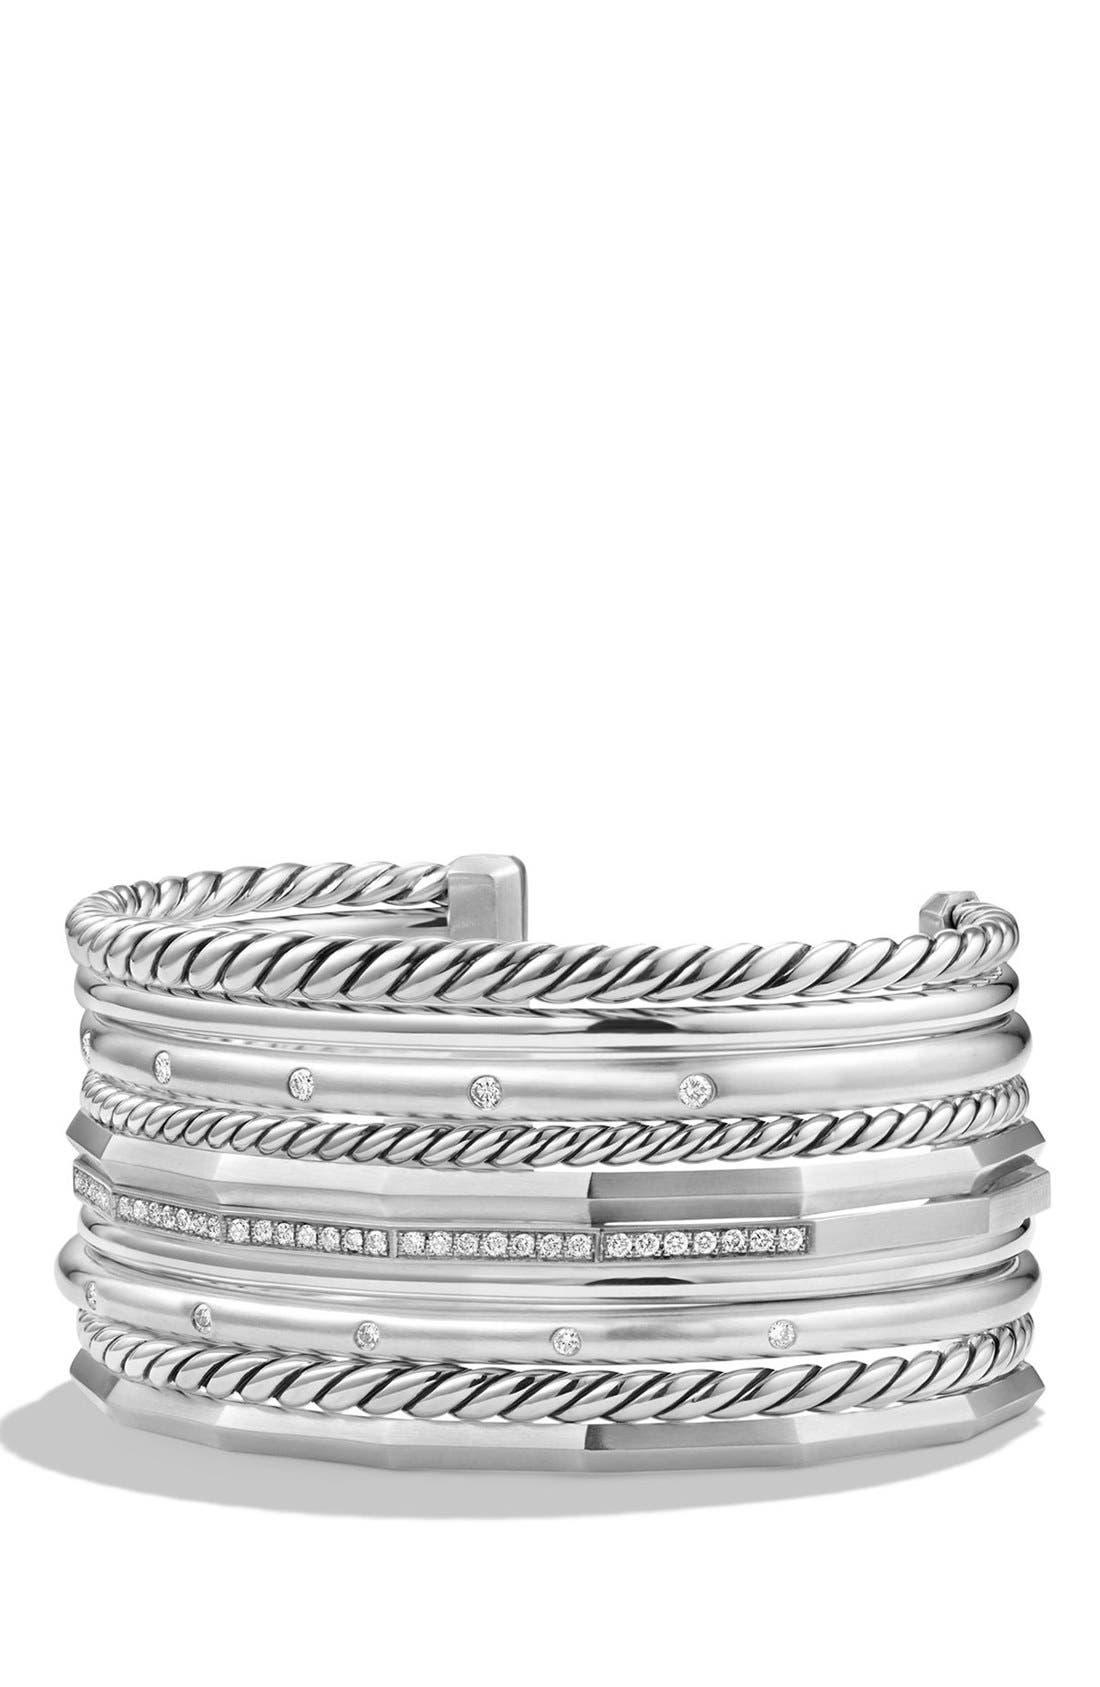 Main Image - David Yurman 'Stax' Wide Cuff Bracelet with Diamonds